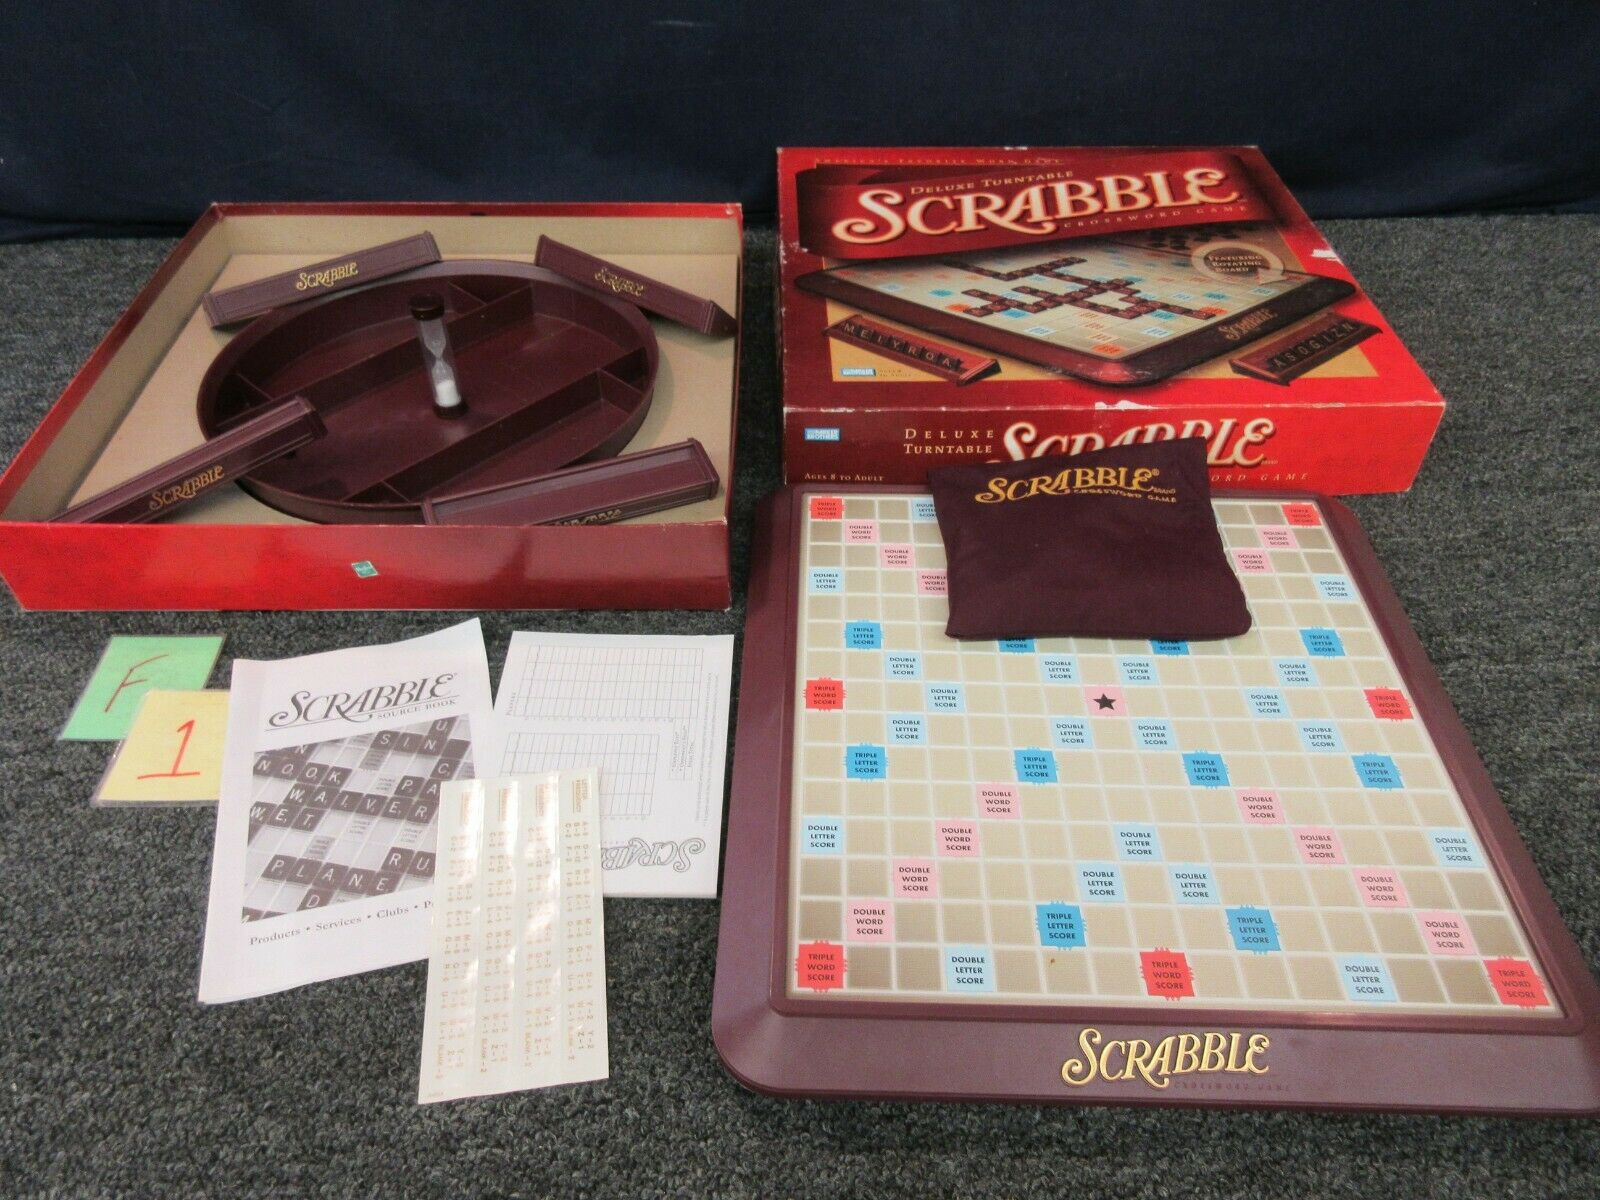 Deluxe Scrabble Crossword gioco with Turn Table  Vintage tavola gioco 2001  punto vendita